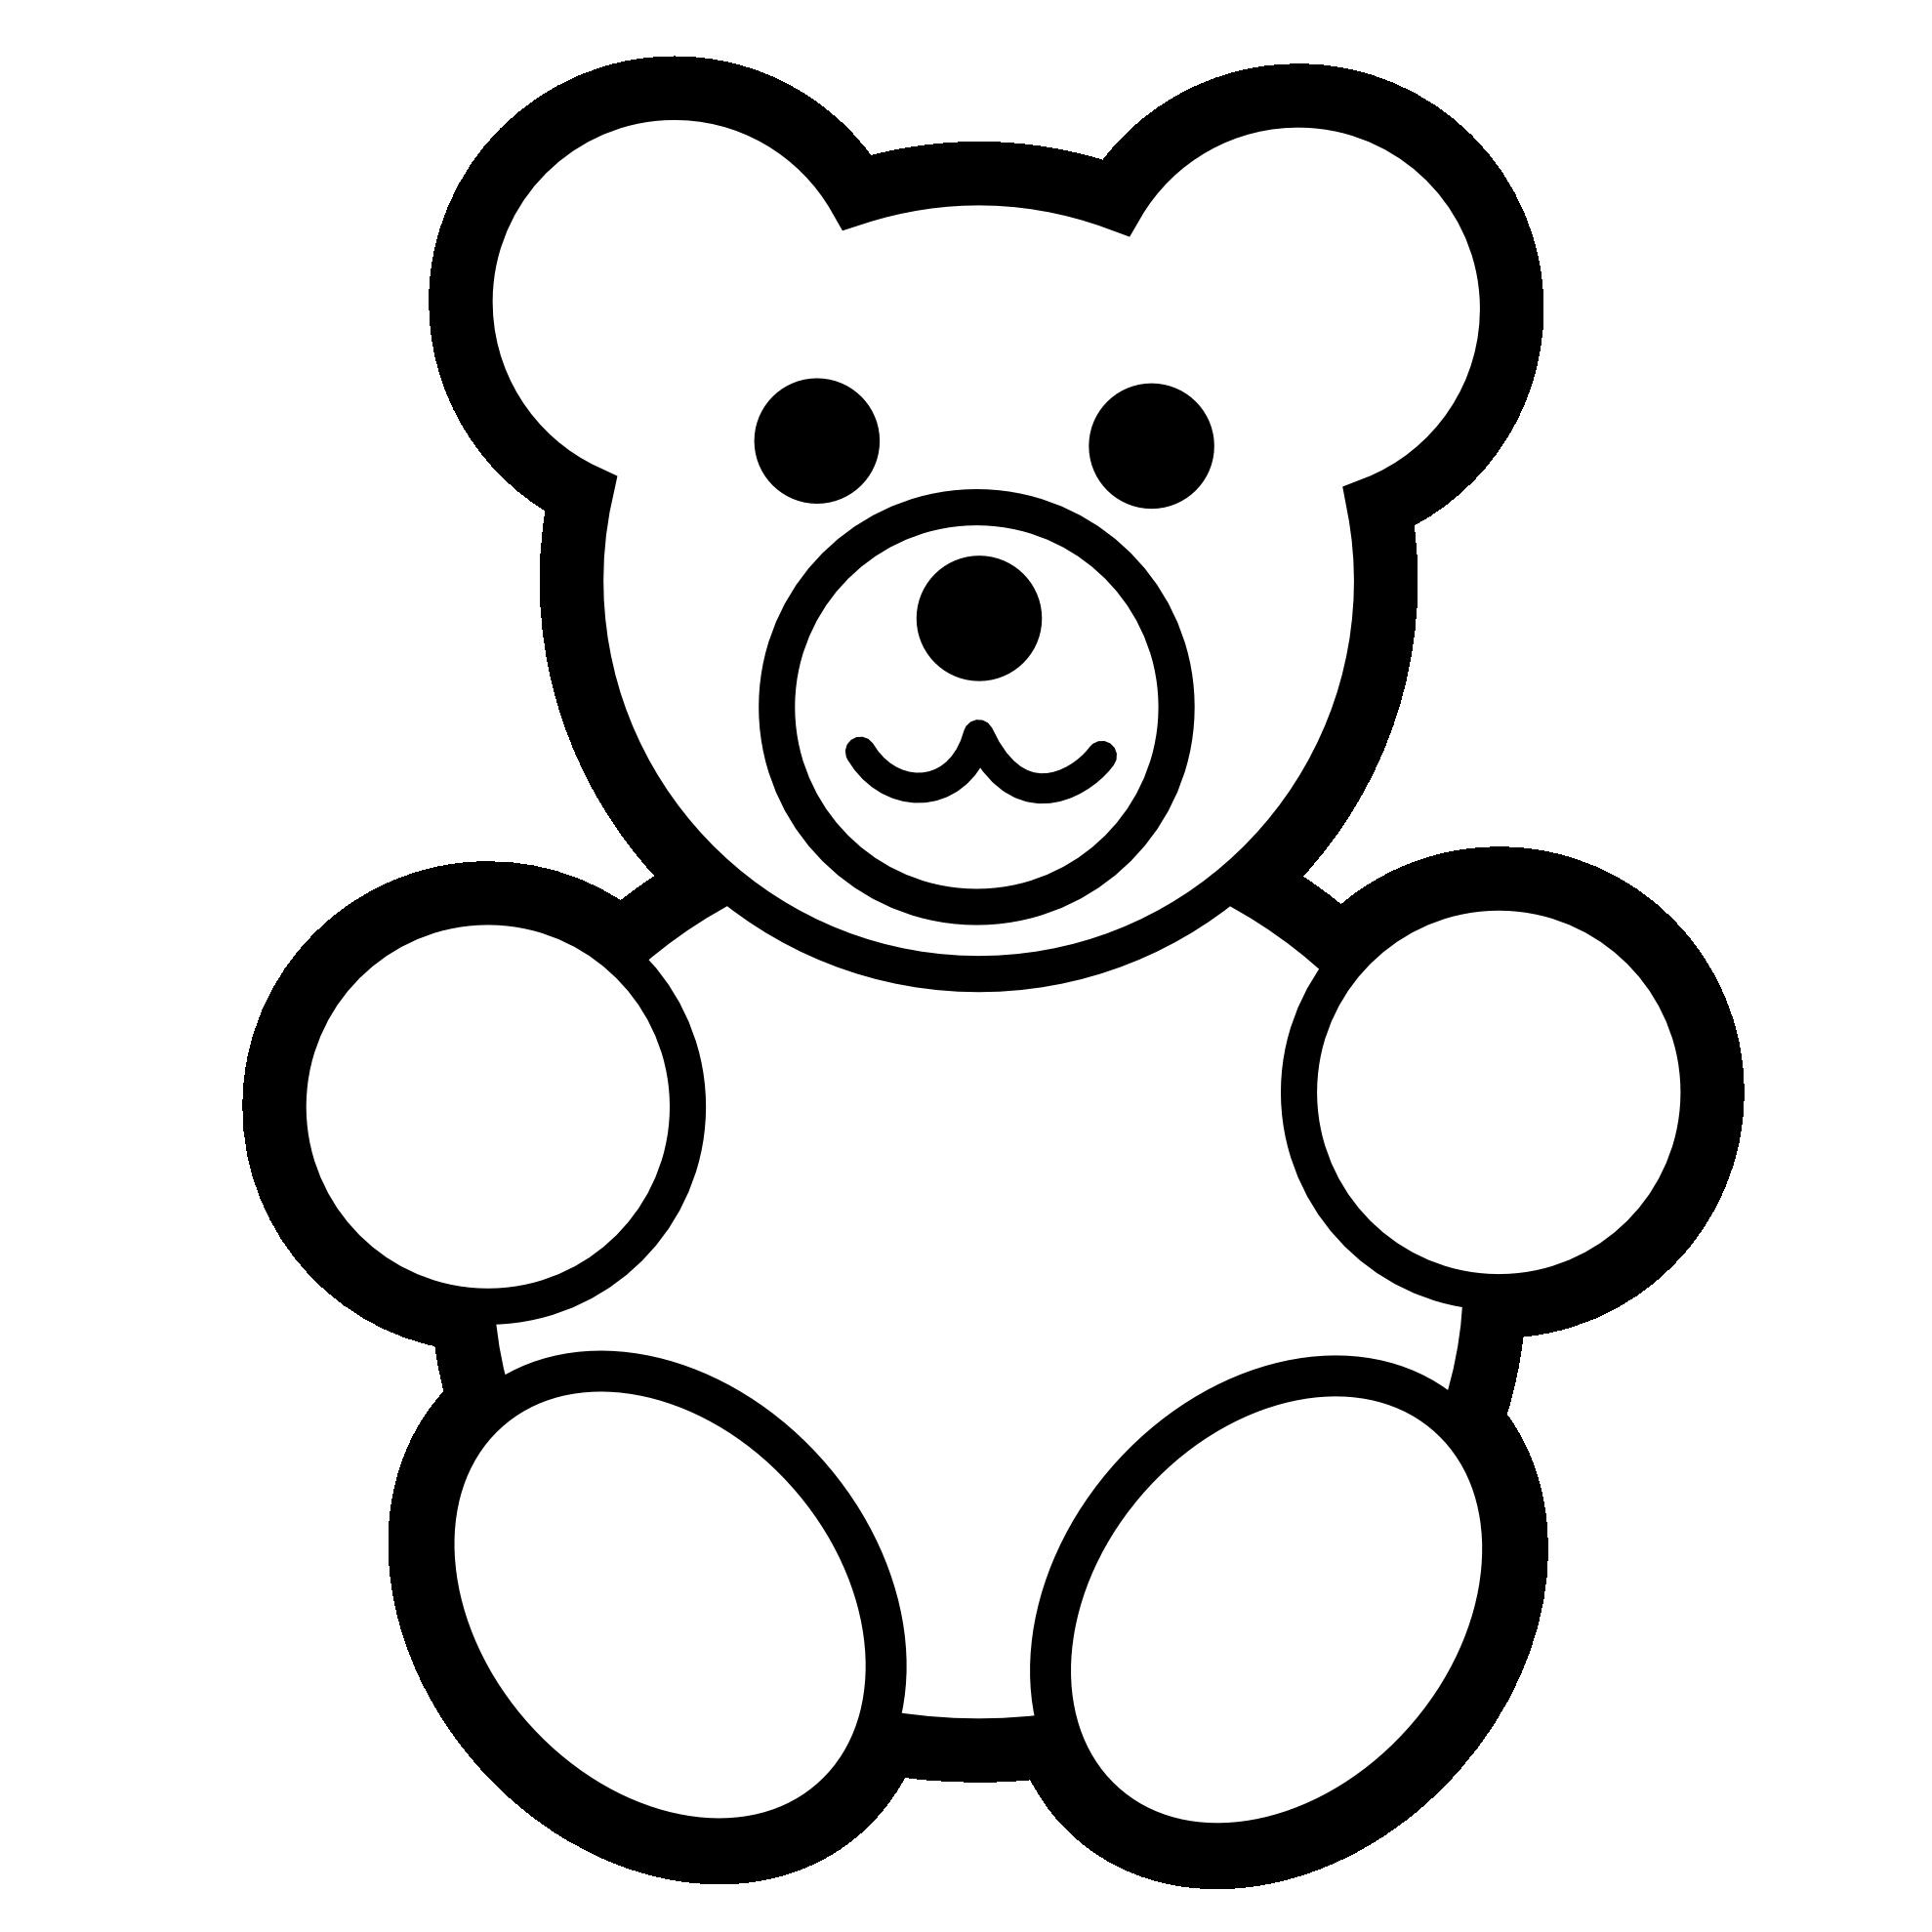 1979x1979 Clip Art Pitr Teddy Bear Icon Black White Line